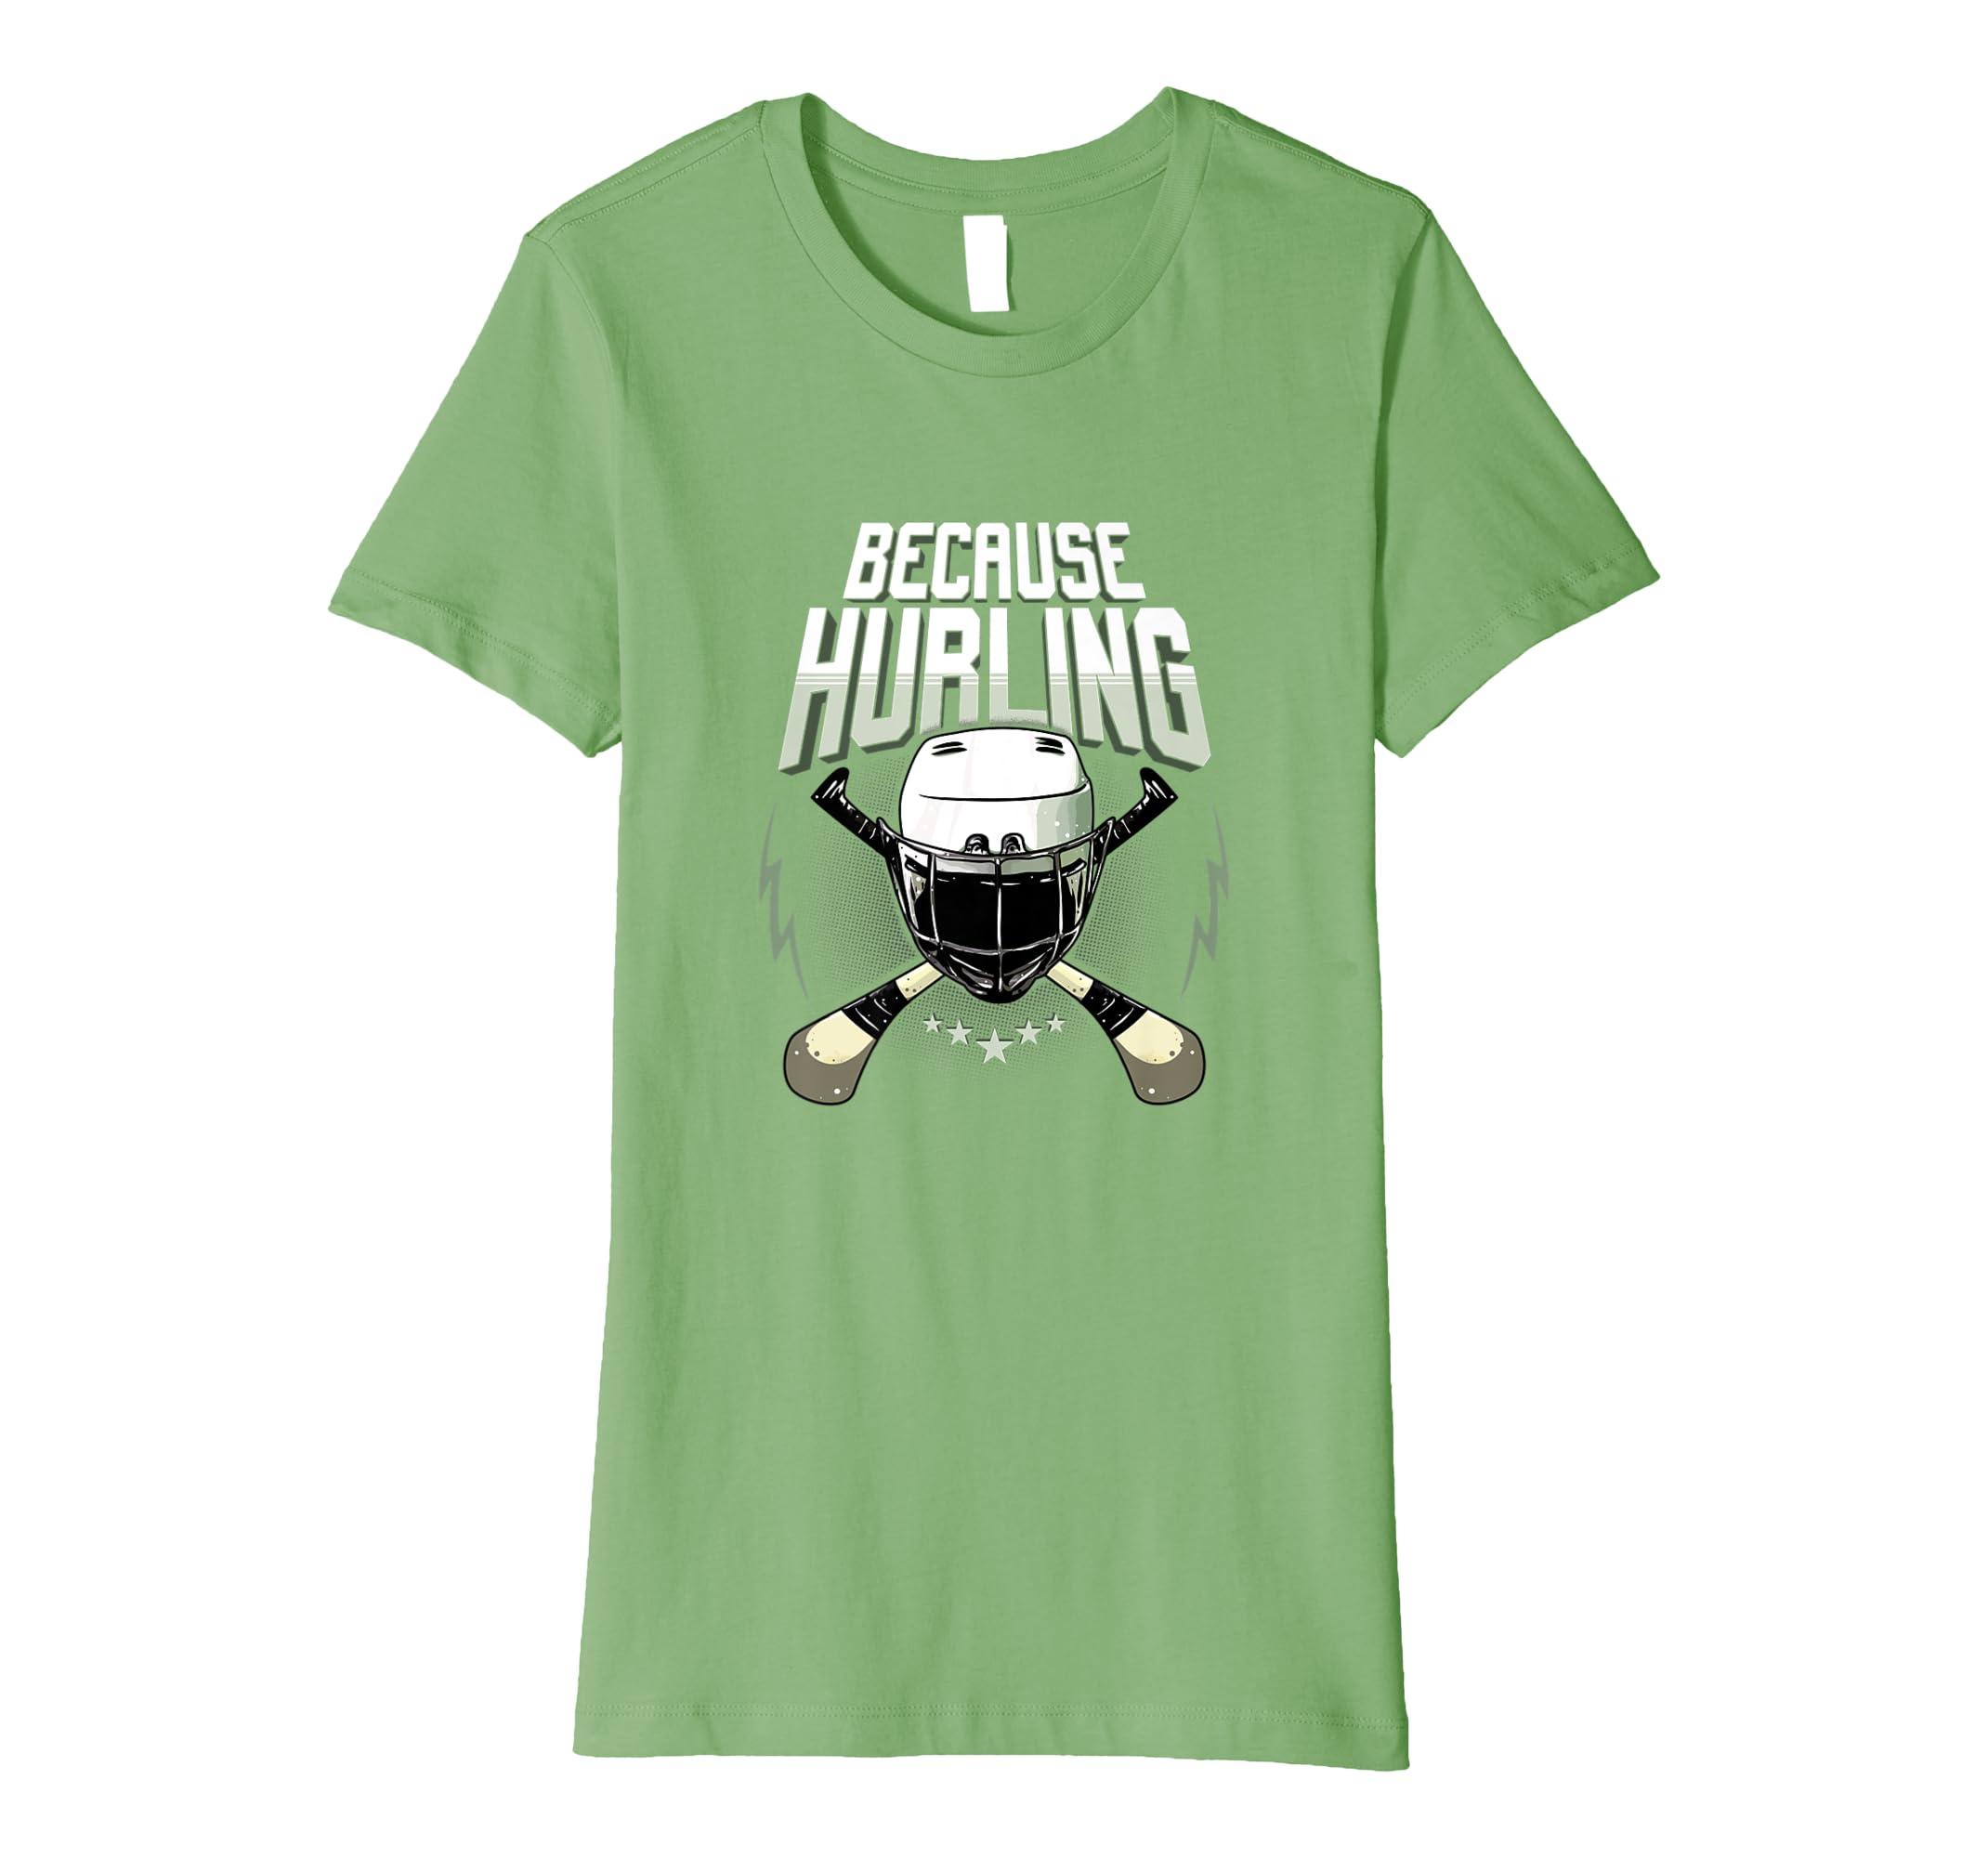 4bf7257a92ff5 Amazon.com: Fun Ireland Hurling Gift T-shirt Love Irish Sports: Clothing